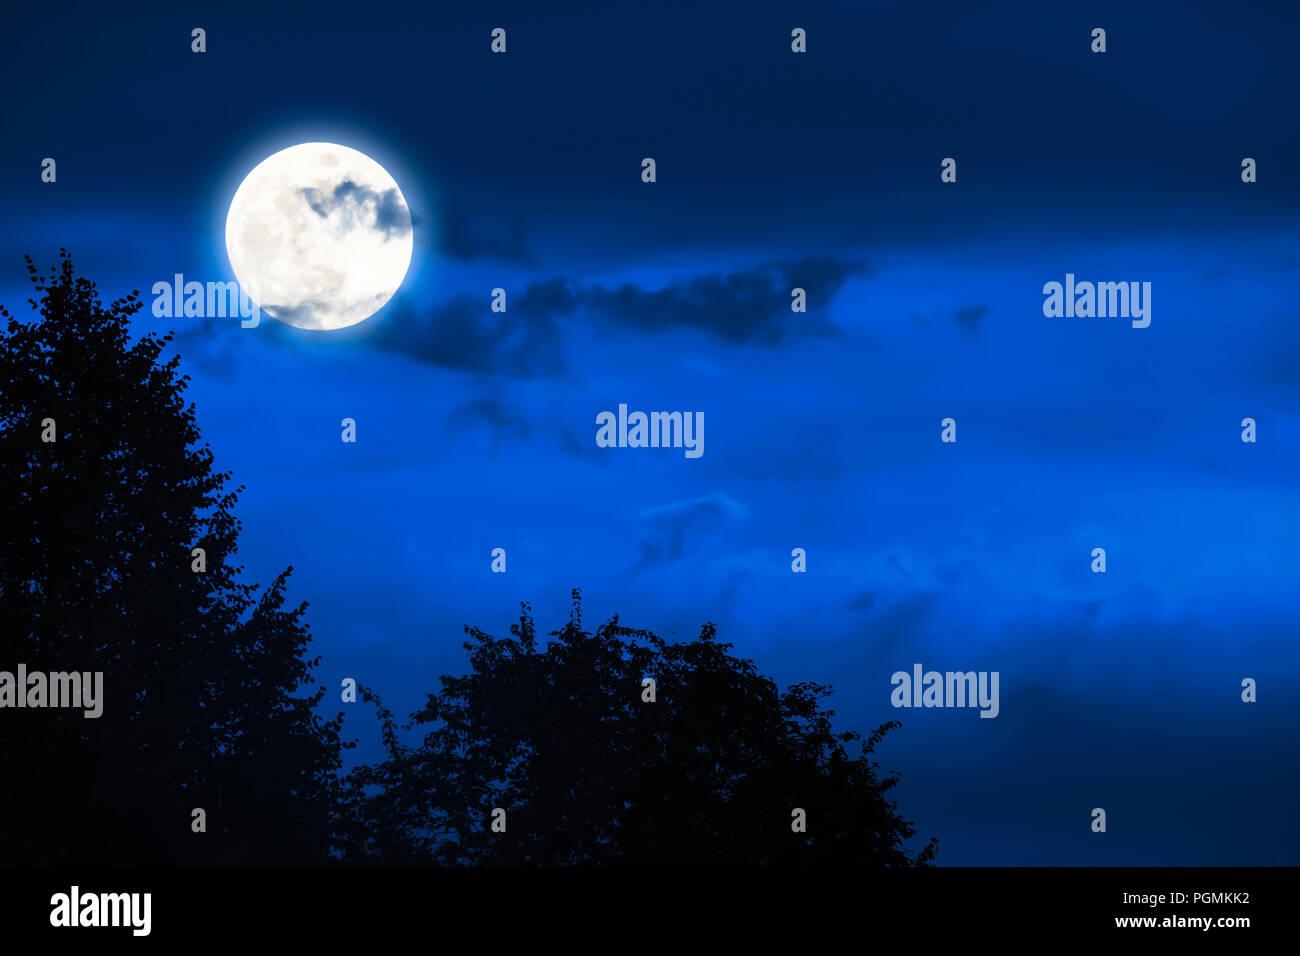 magic full moon at the night sky - Stock Image